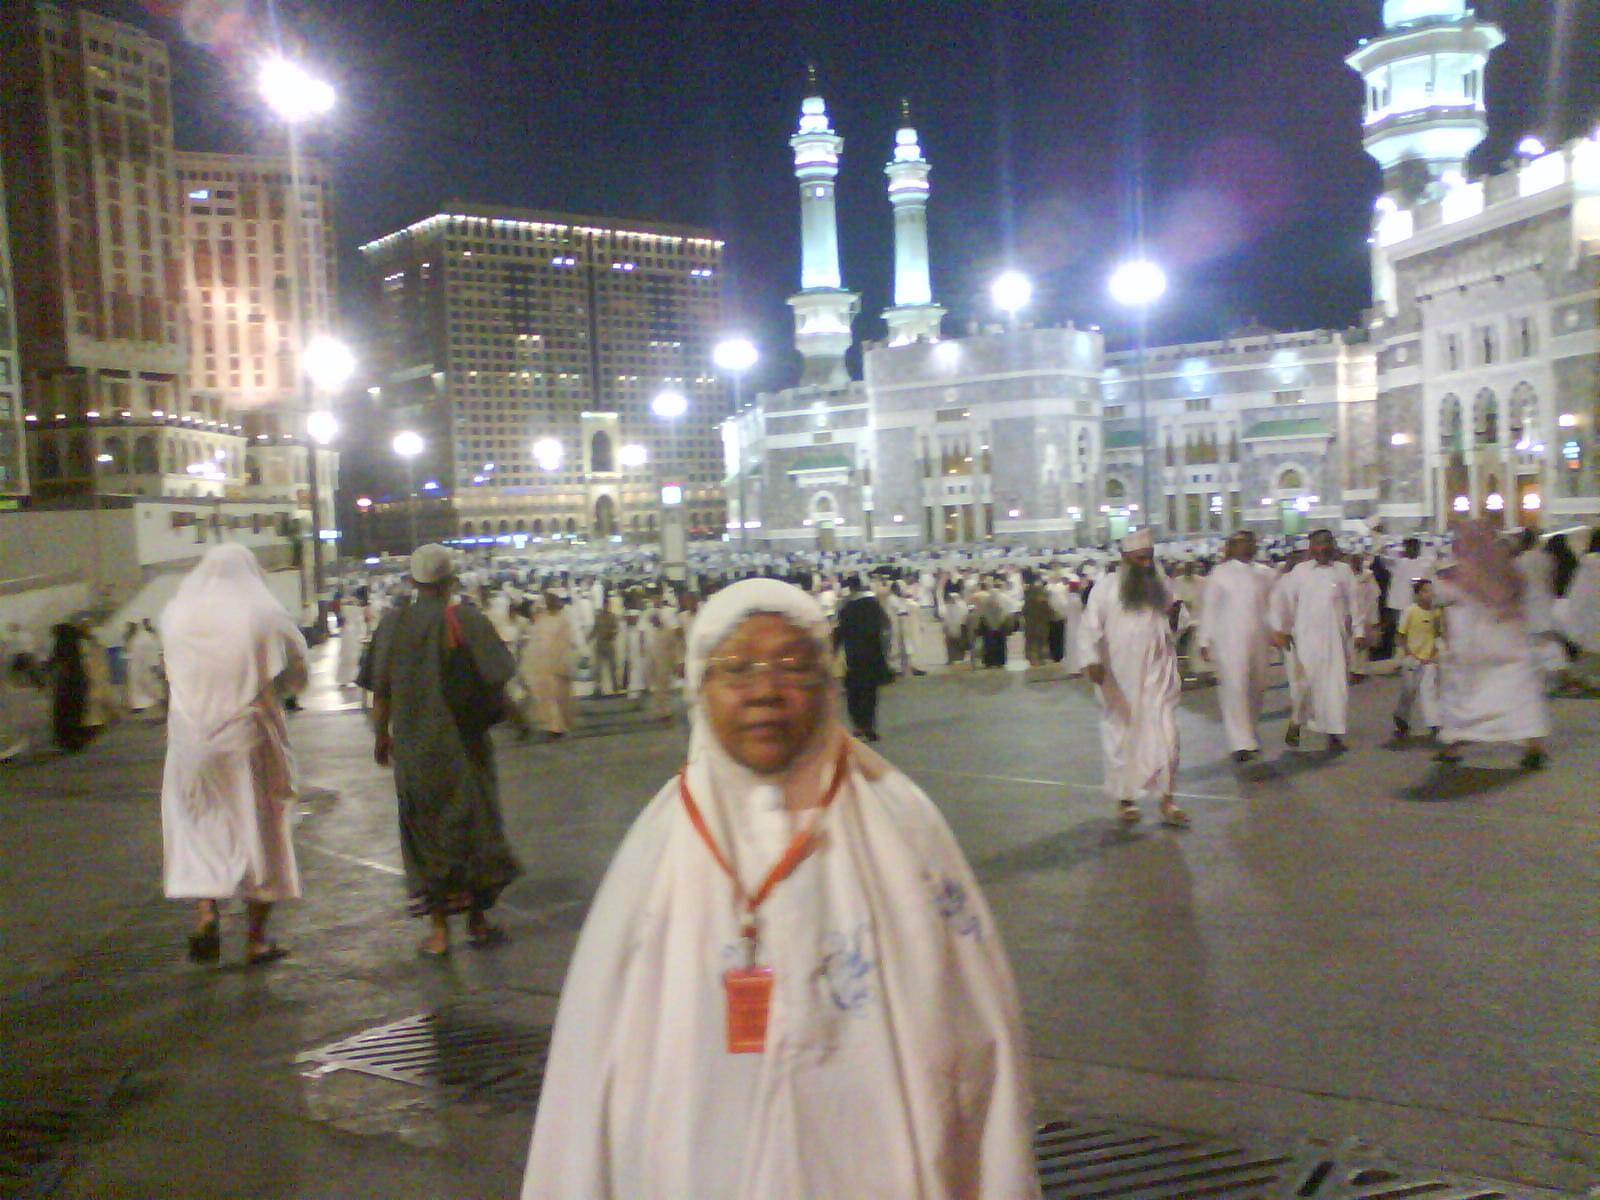 My beloved wife in front yard of King Abdel Azis Gate of Masjid al Haram, Mecca